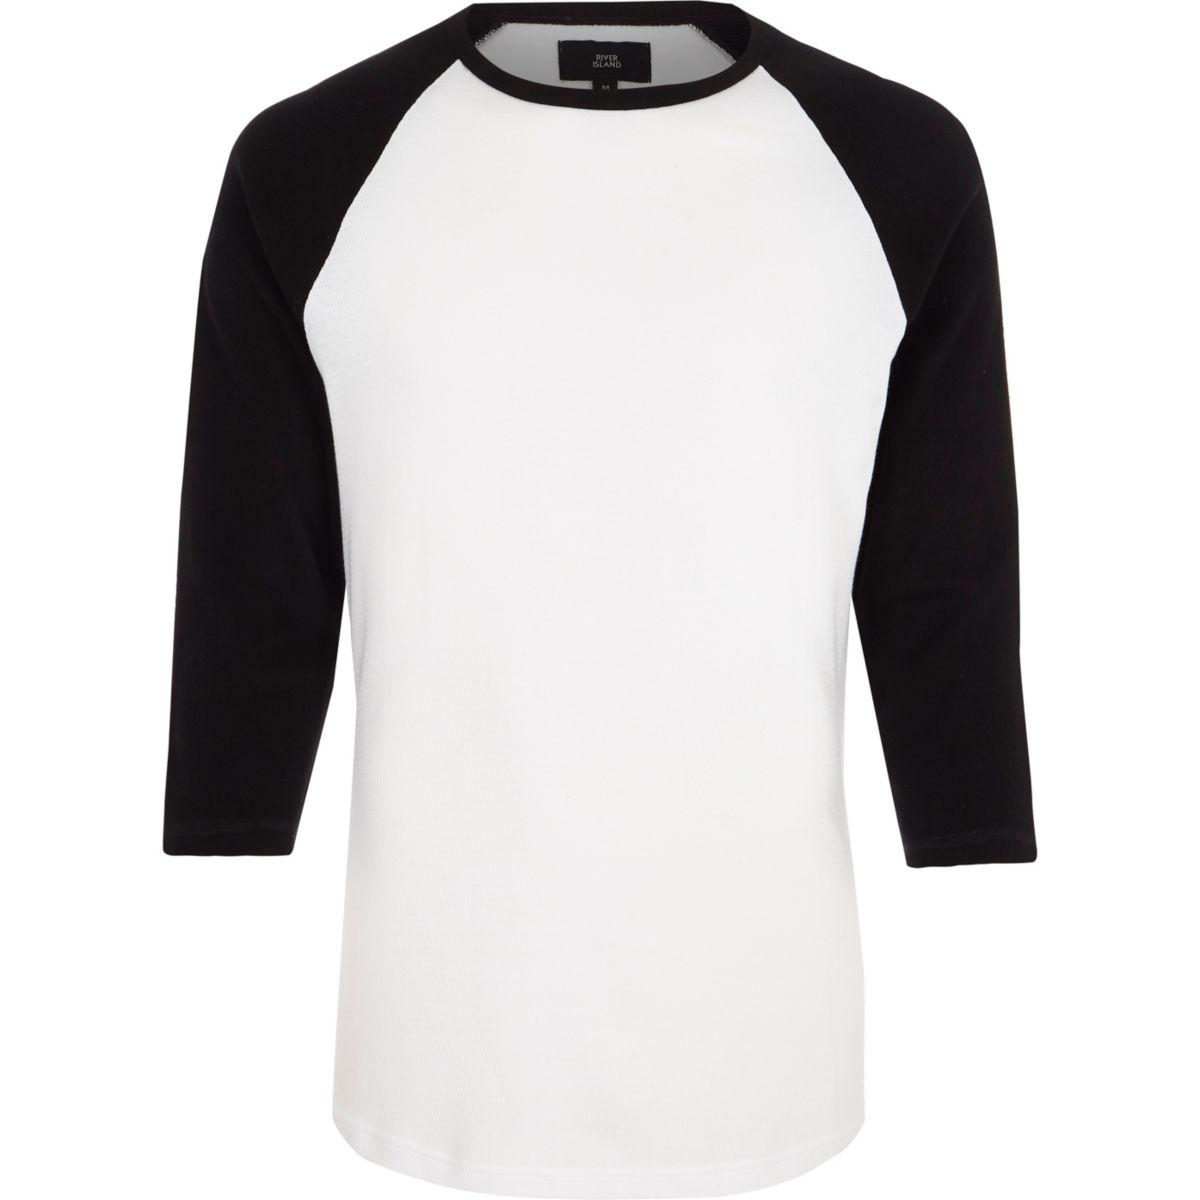 Black three quarter raglan sleeve T-shirt